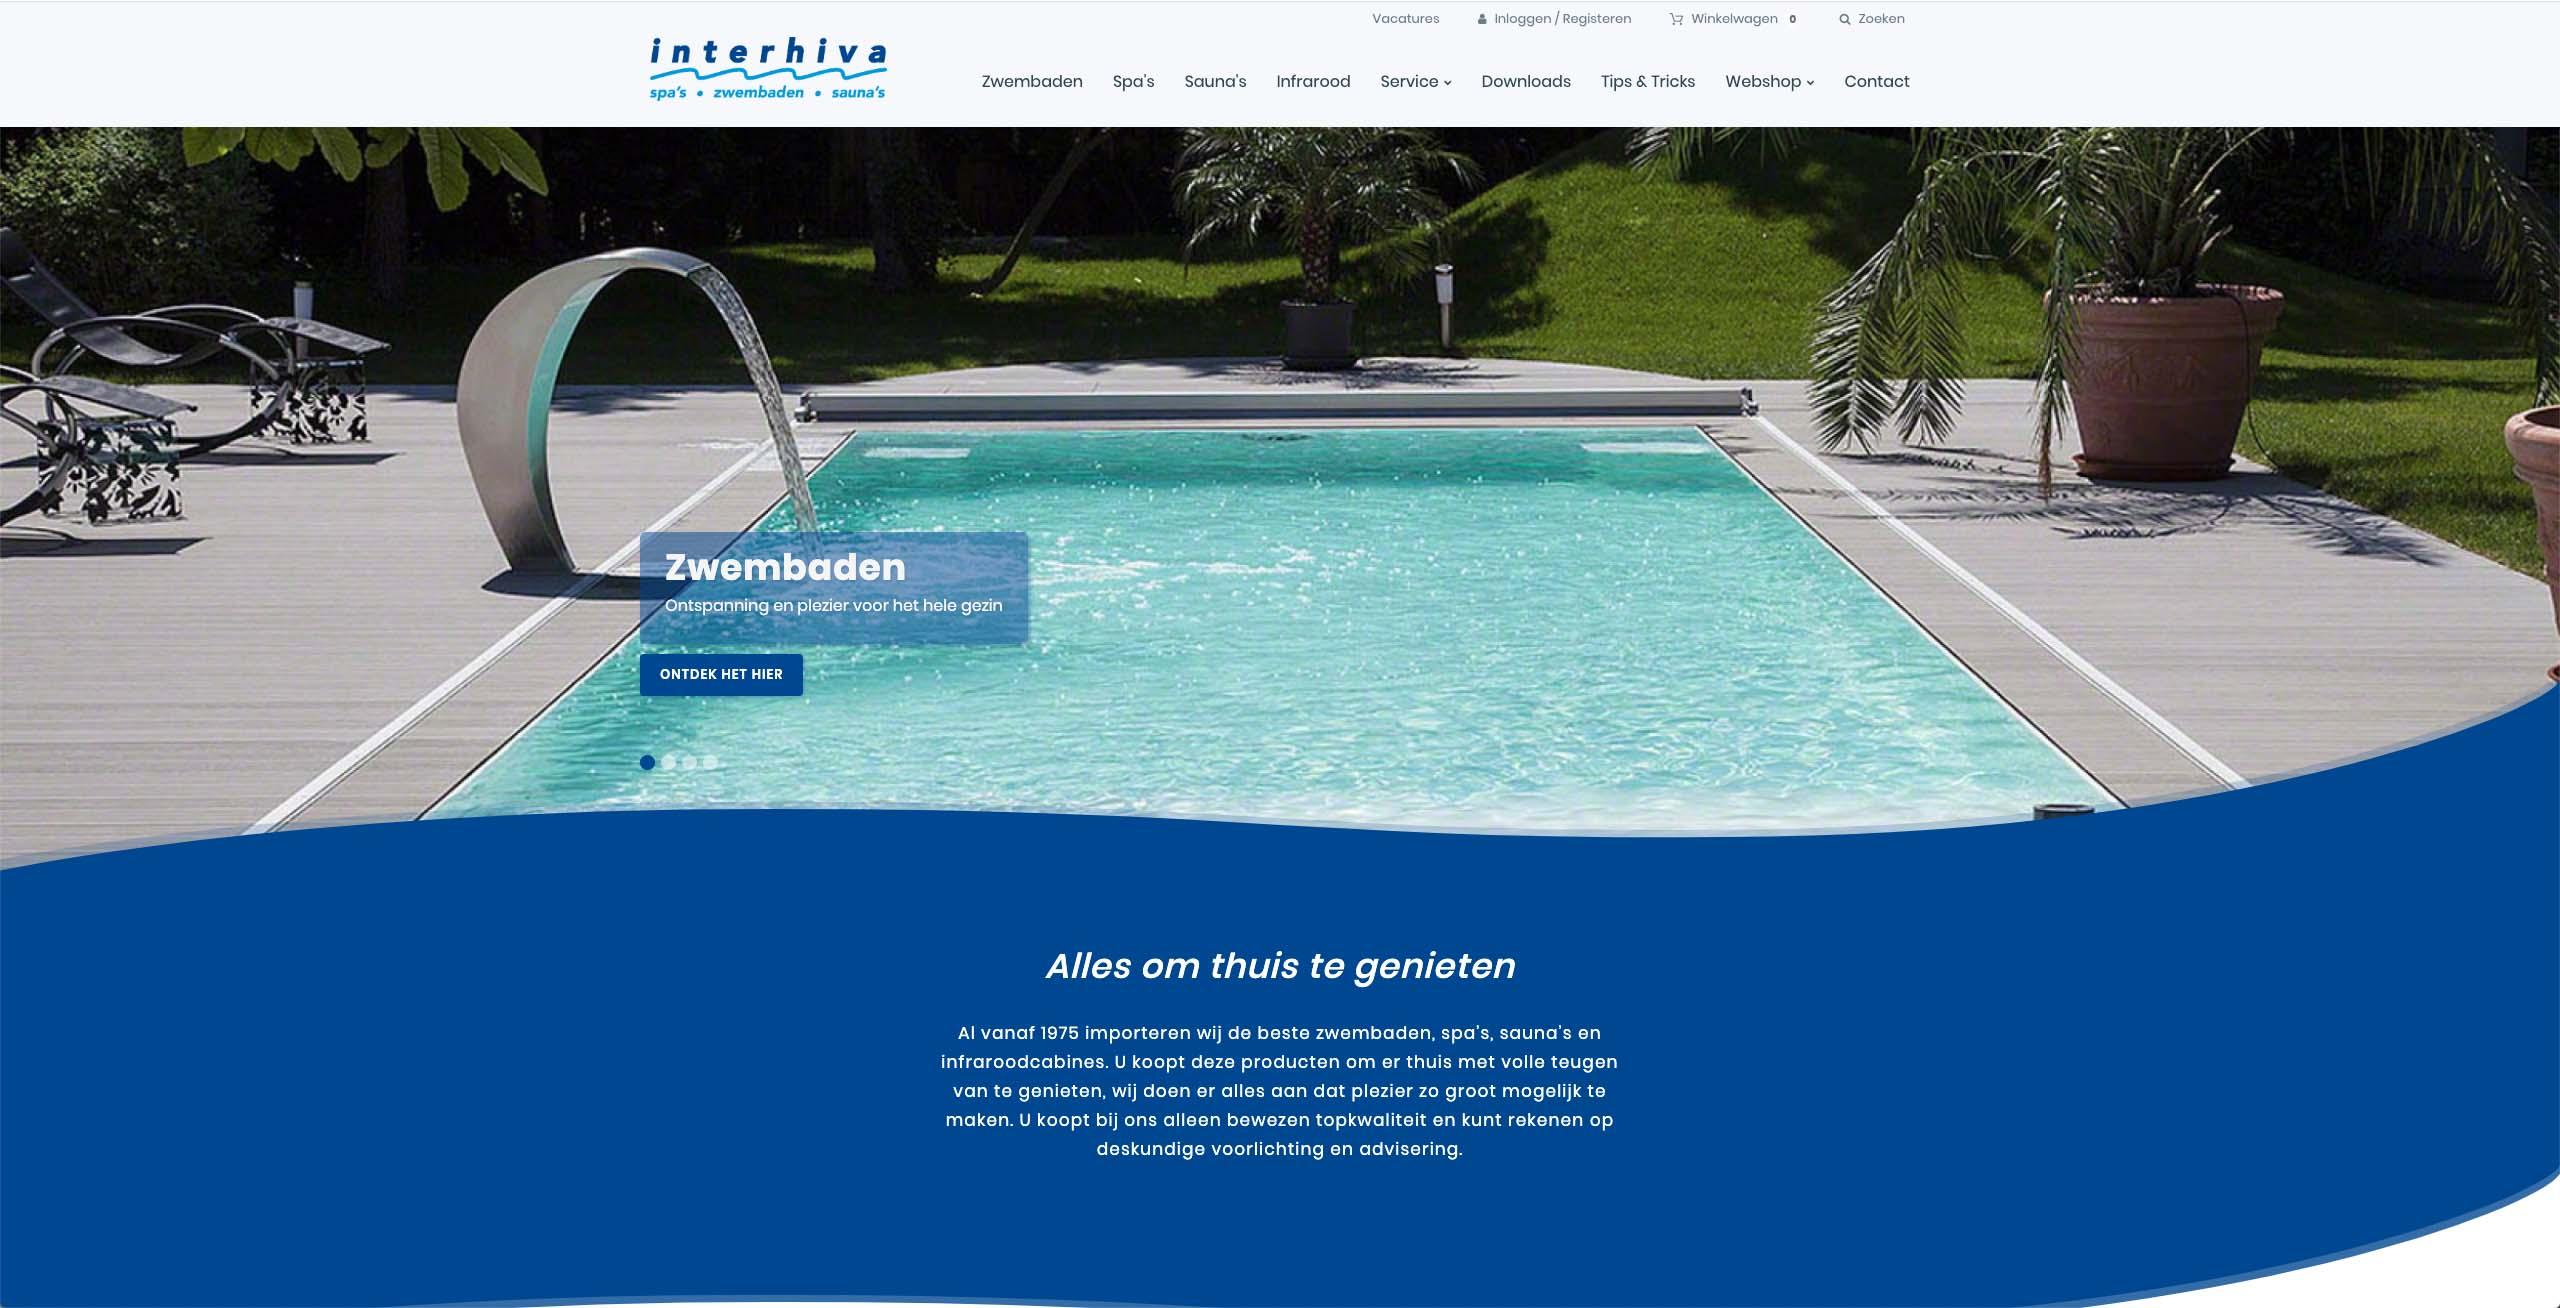 homepage-portfolio-interhiva